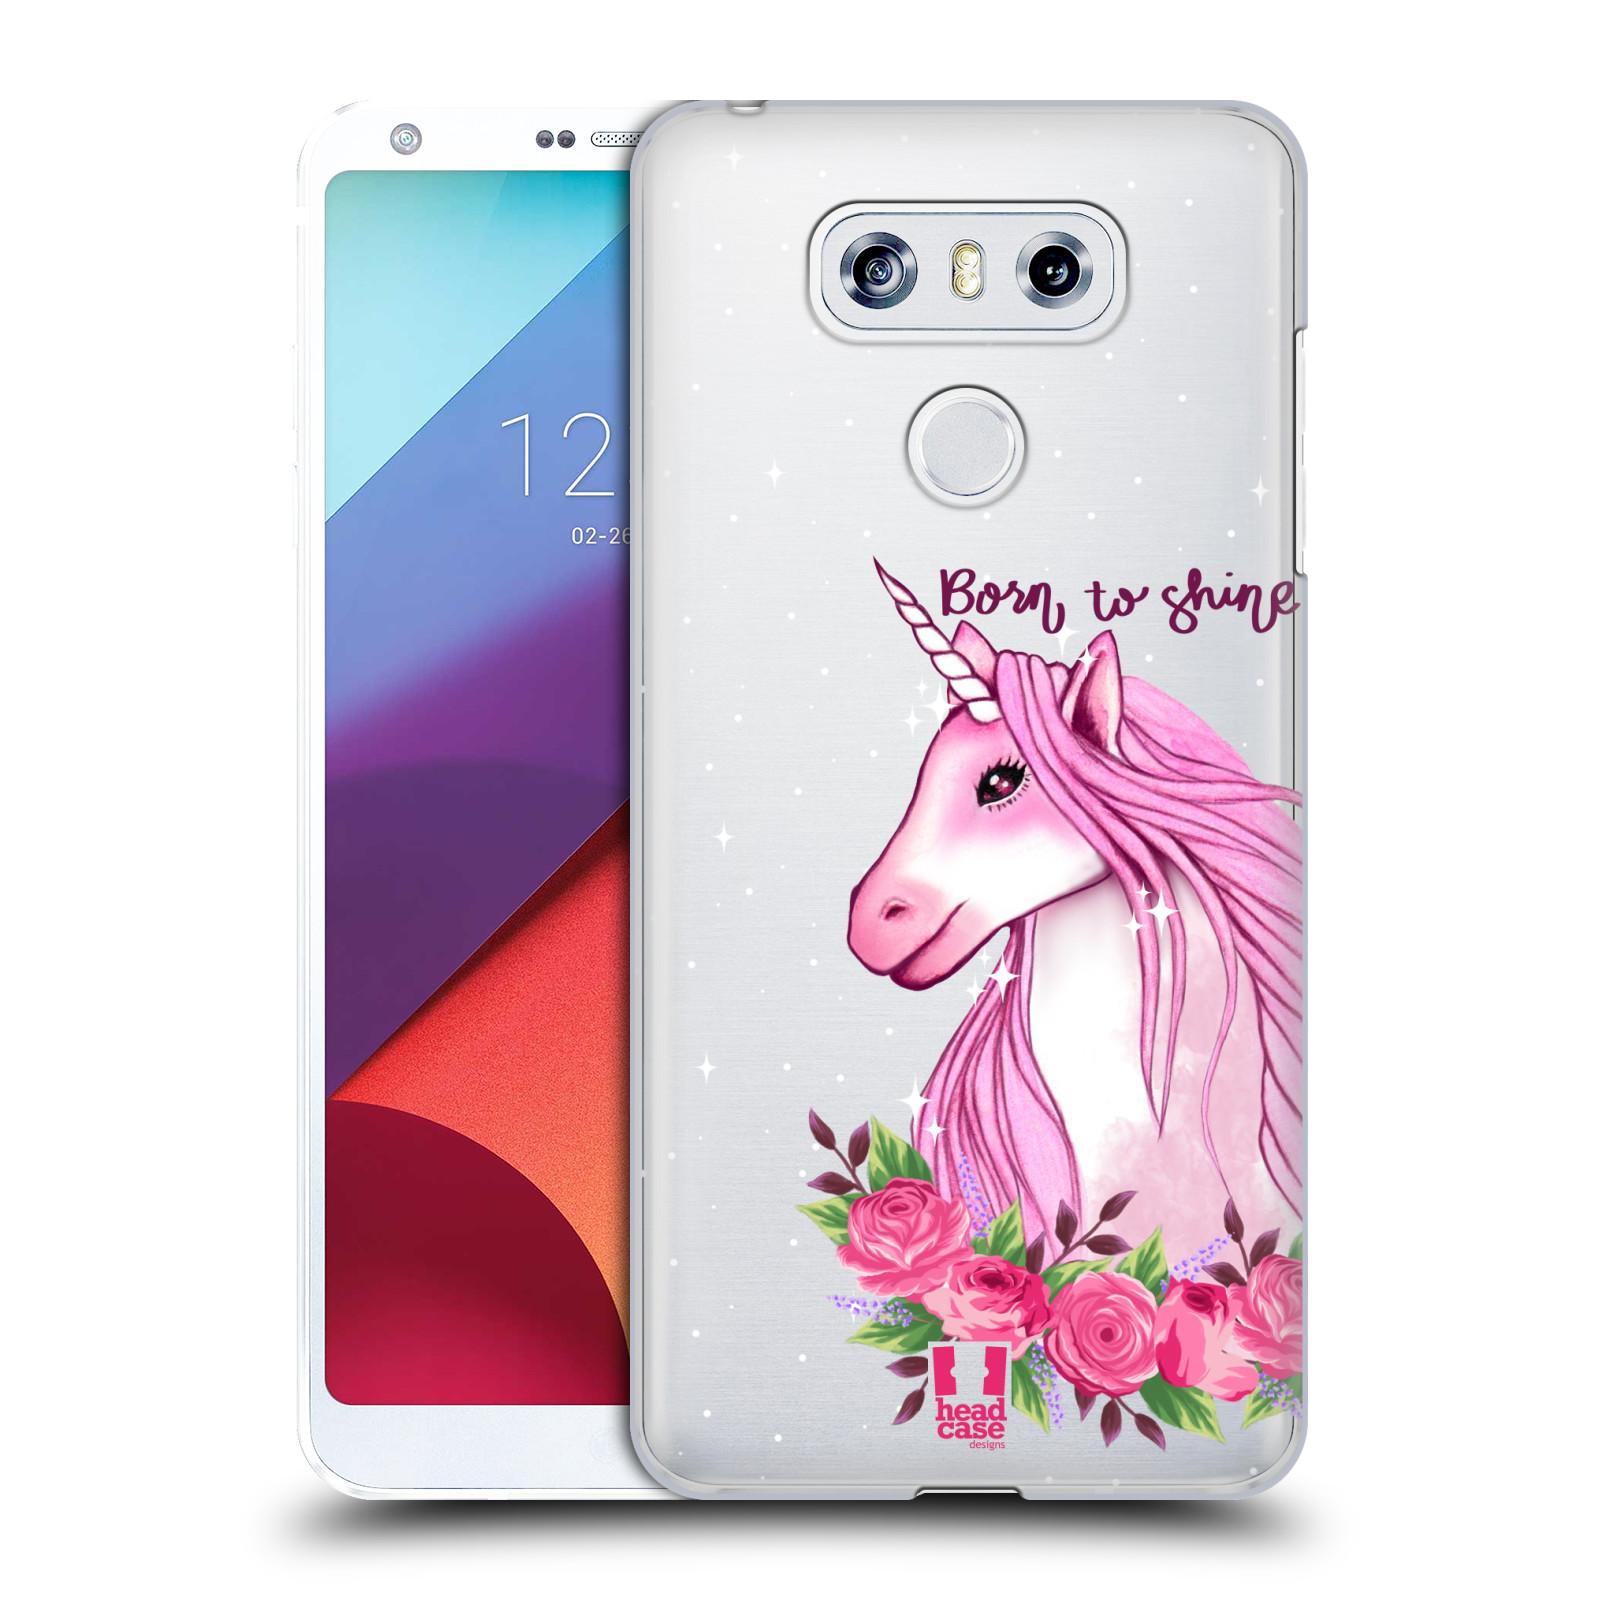 Plastové pouzdro na mobil LG G6 - Head Case - Jednorožec - Born to shine